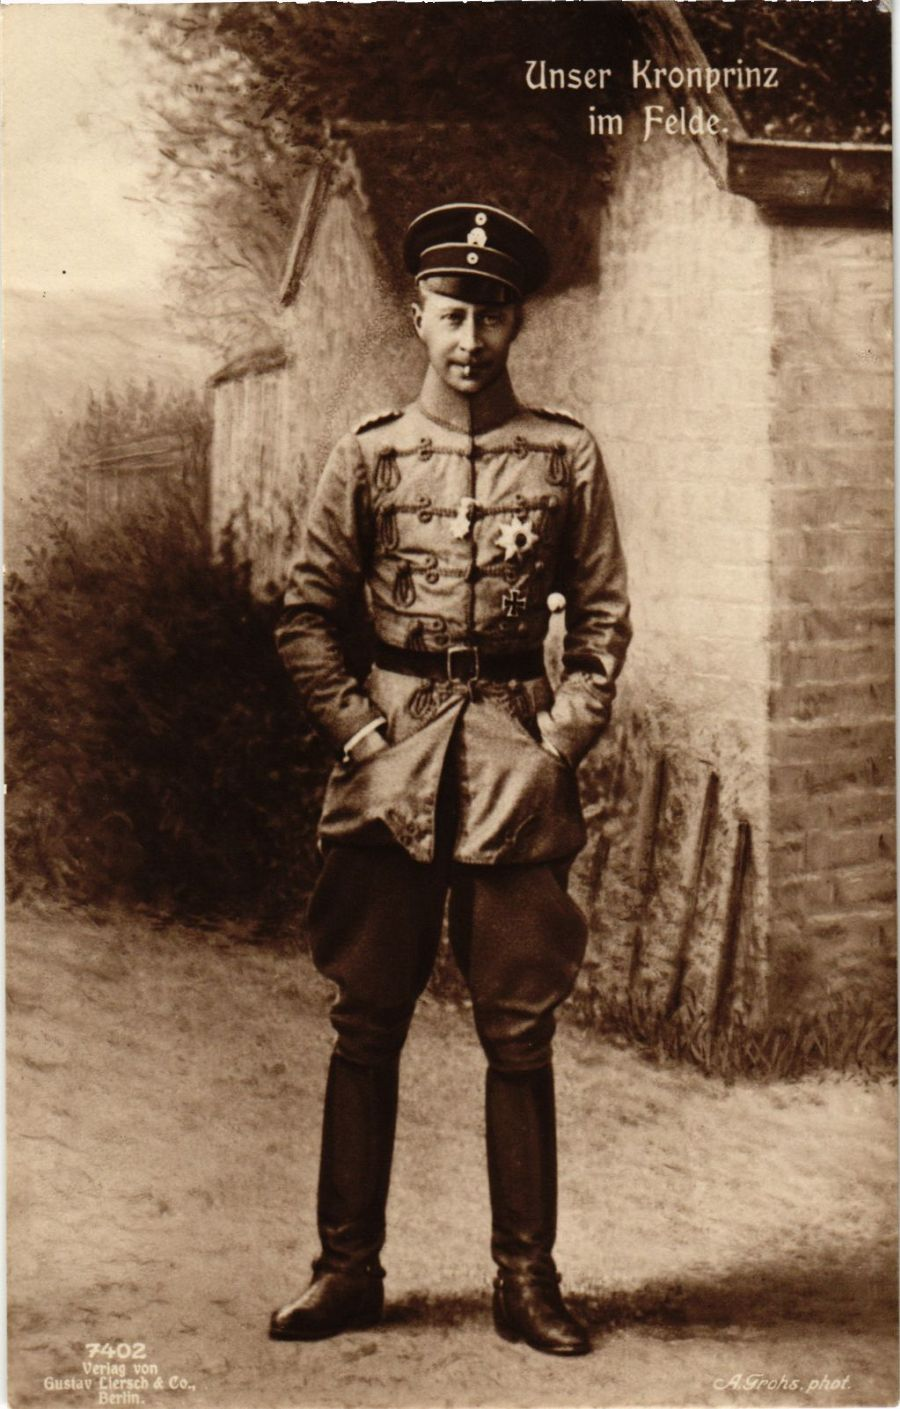 CPA-AK-Kronprinz-Wilhelm-im-Felde-GERMAN-ROYALTY-867518